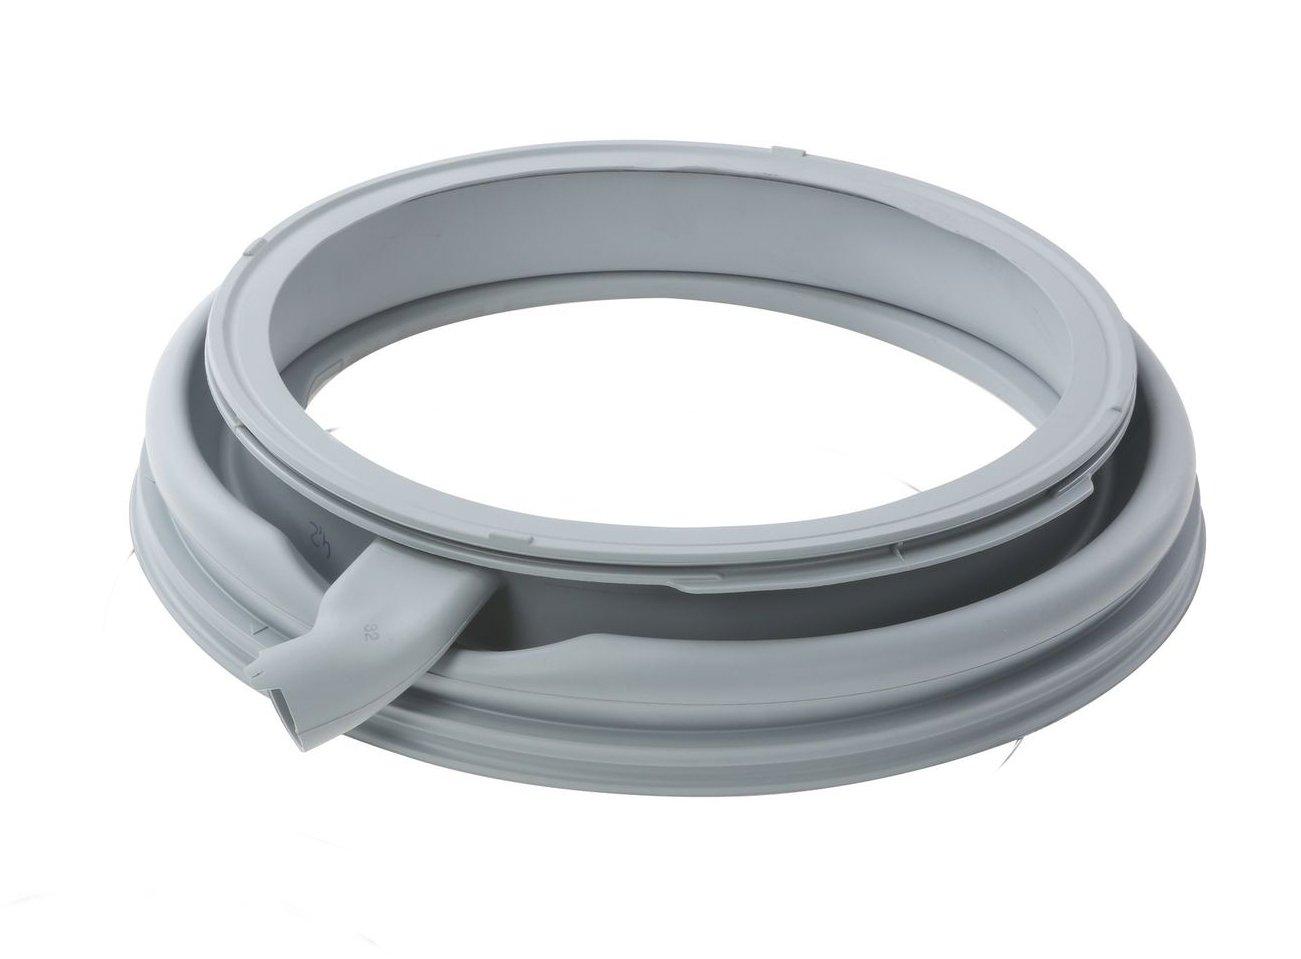 SpareHome Goma escotilla de alta calidad para lavadoras Bosch ...